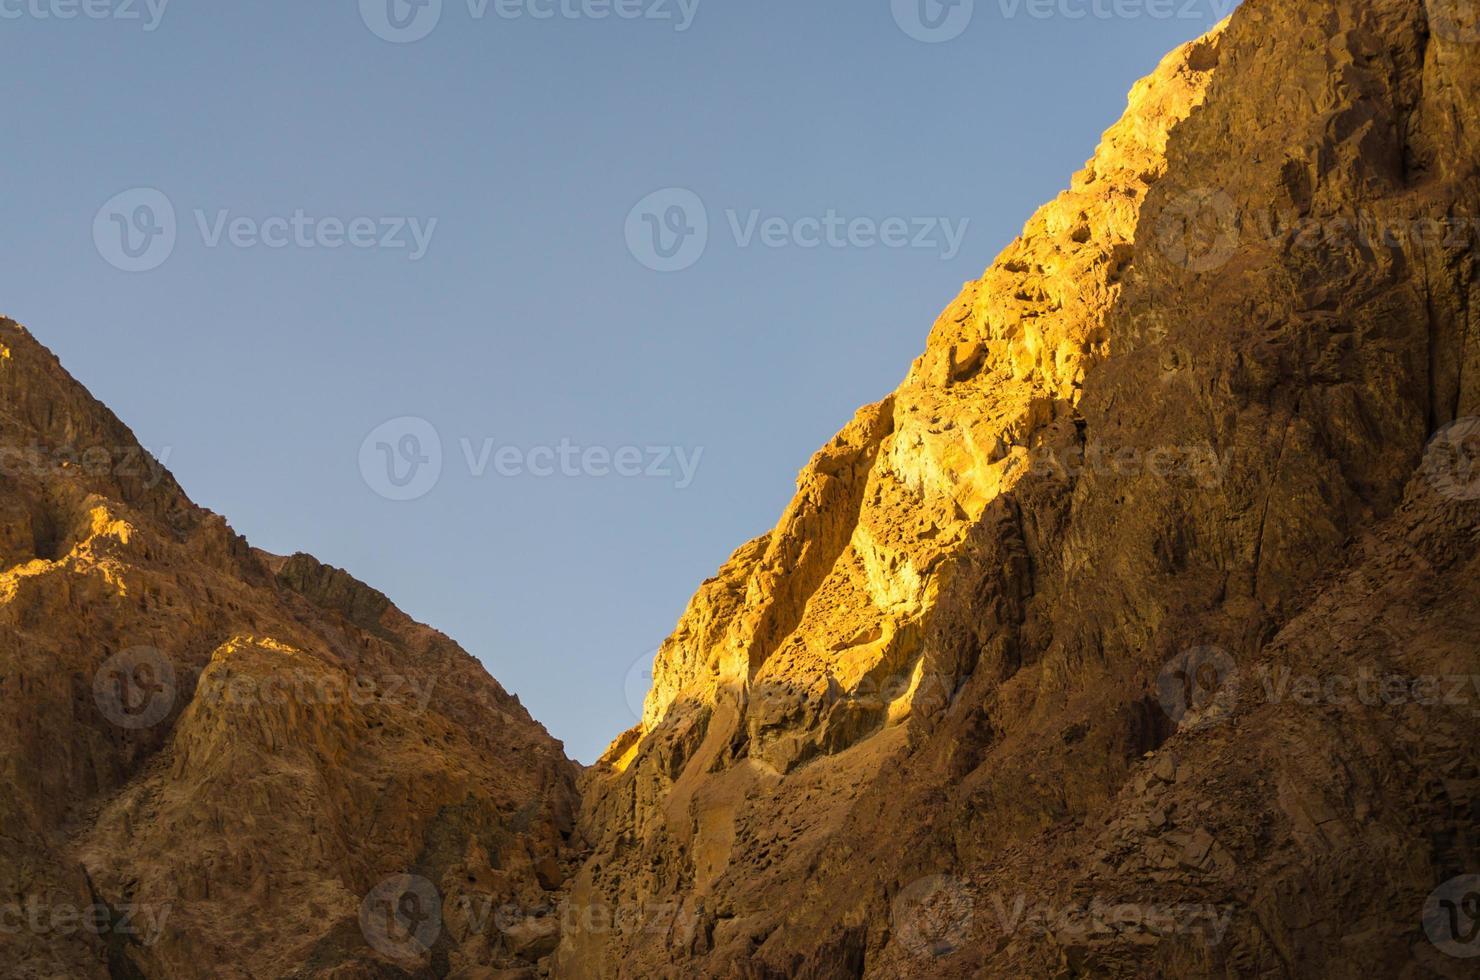 zonlicht op bergen foto